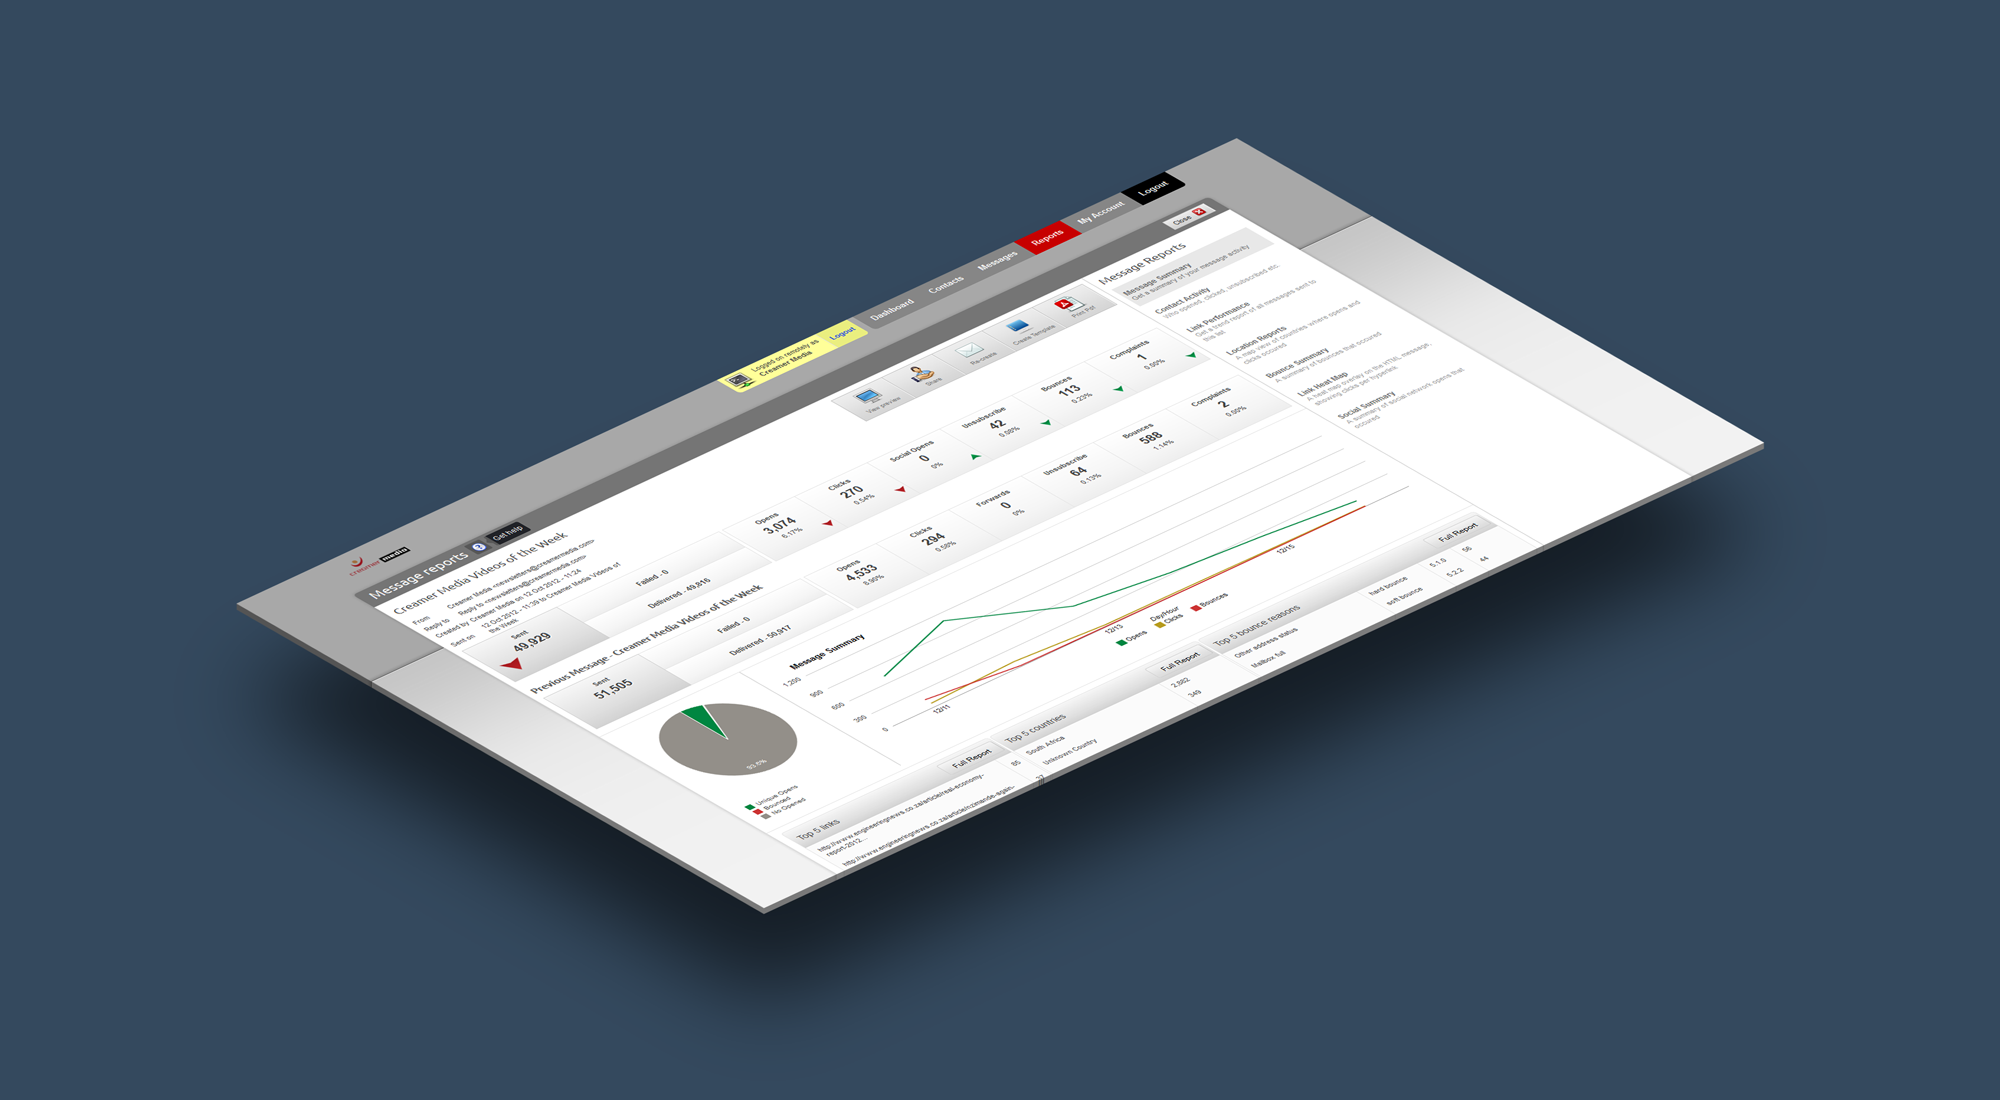 Original Analytics Dashboard